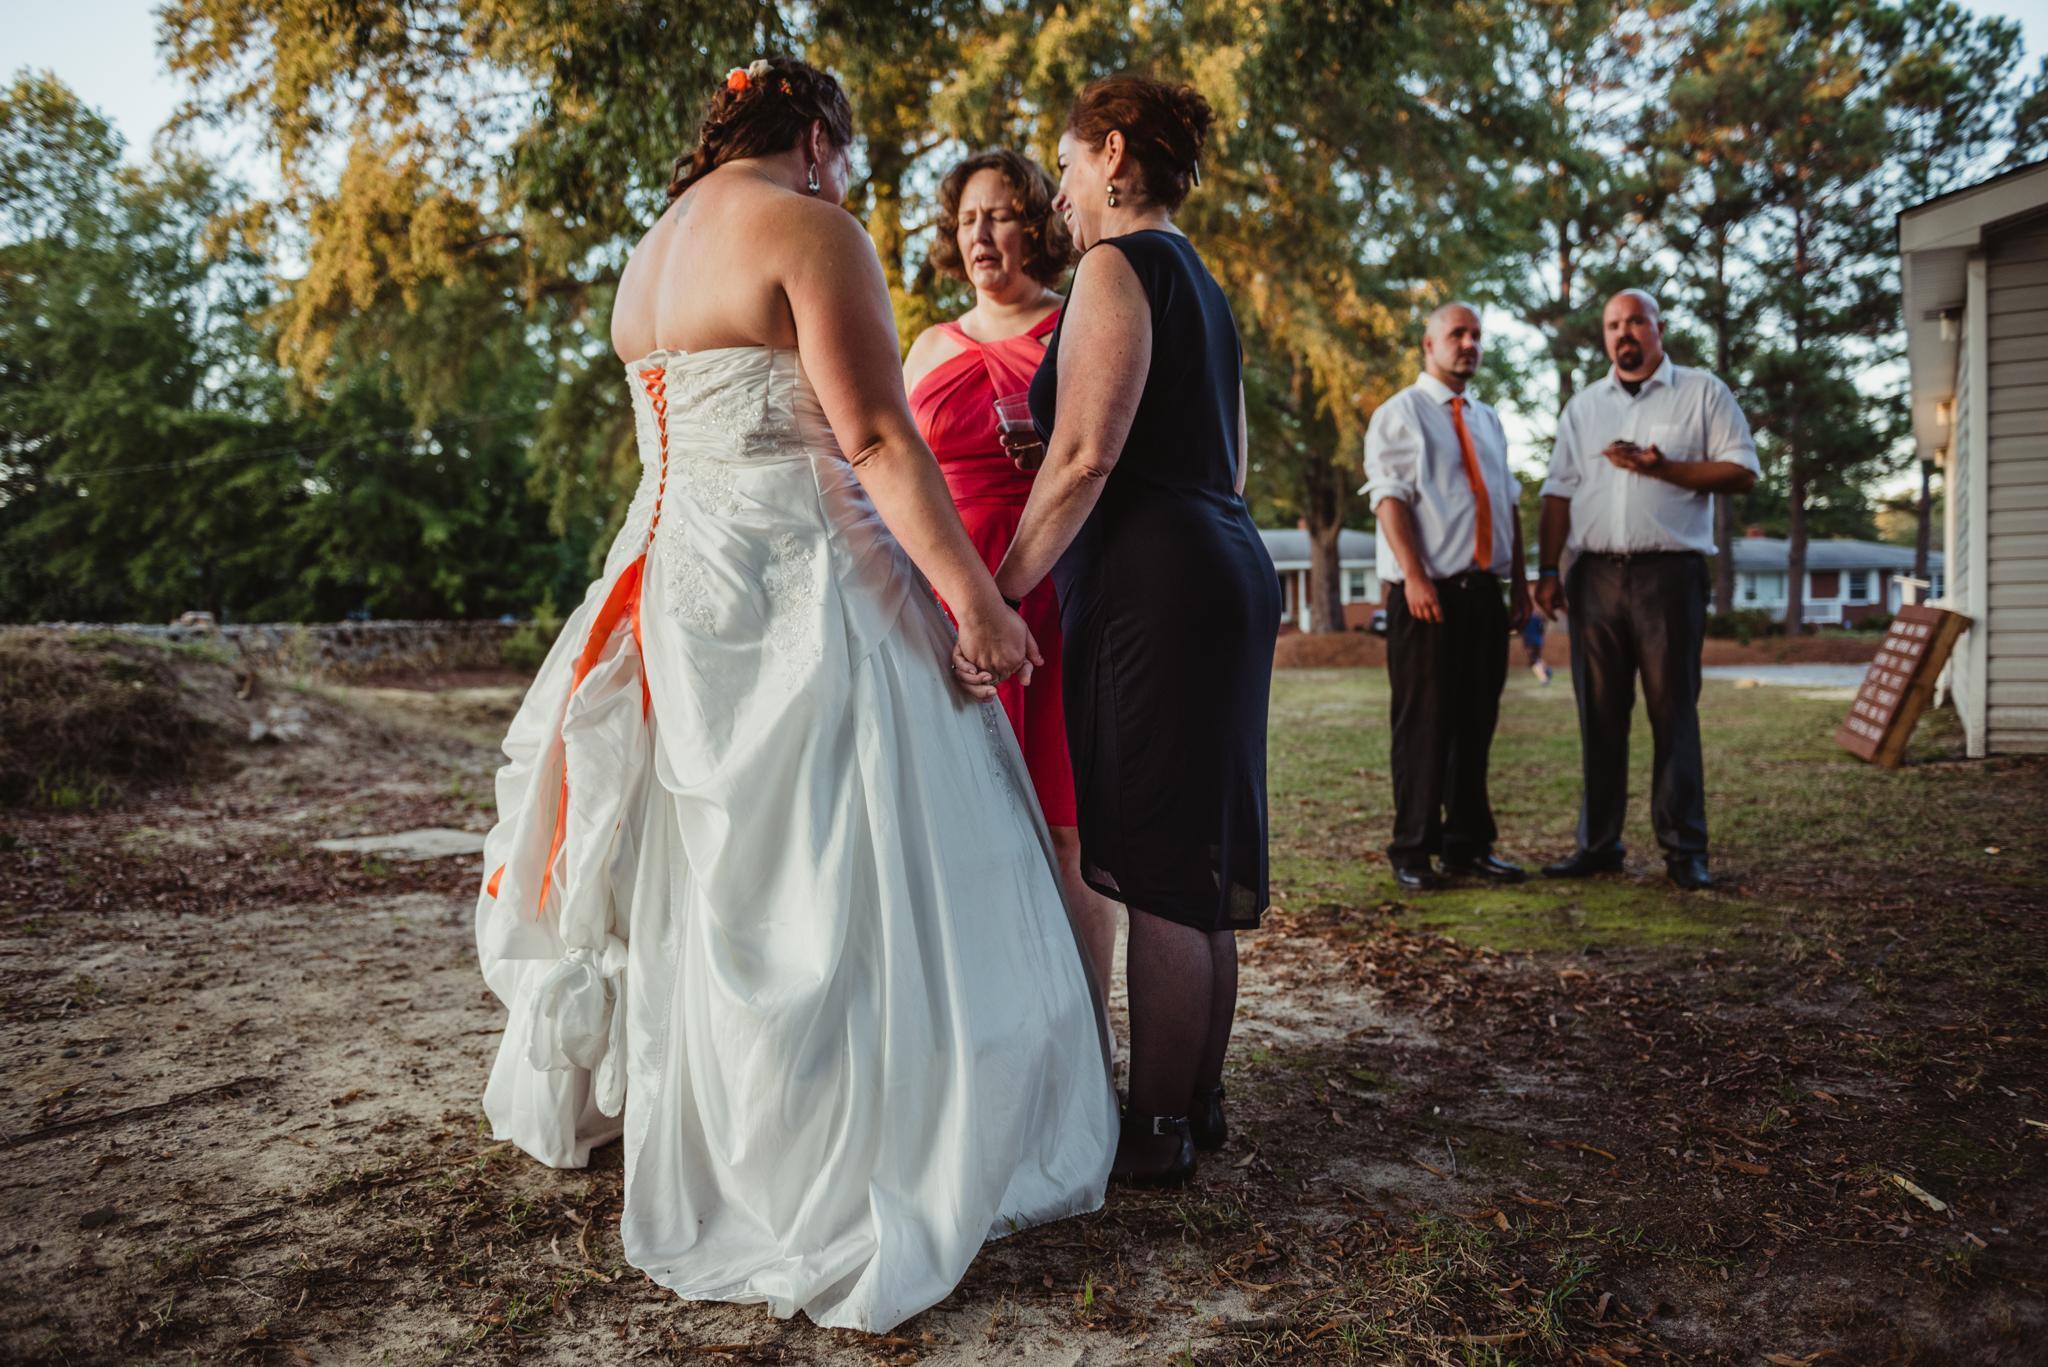 raleigh-wedding-outdoor-reception-prayer-circle-cd.jpg